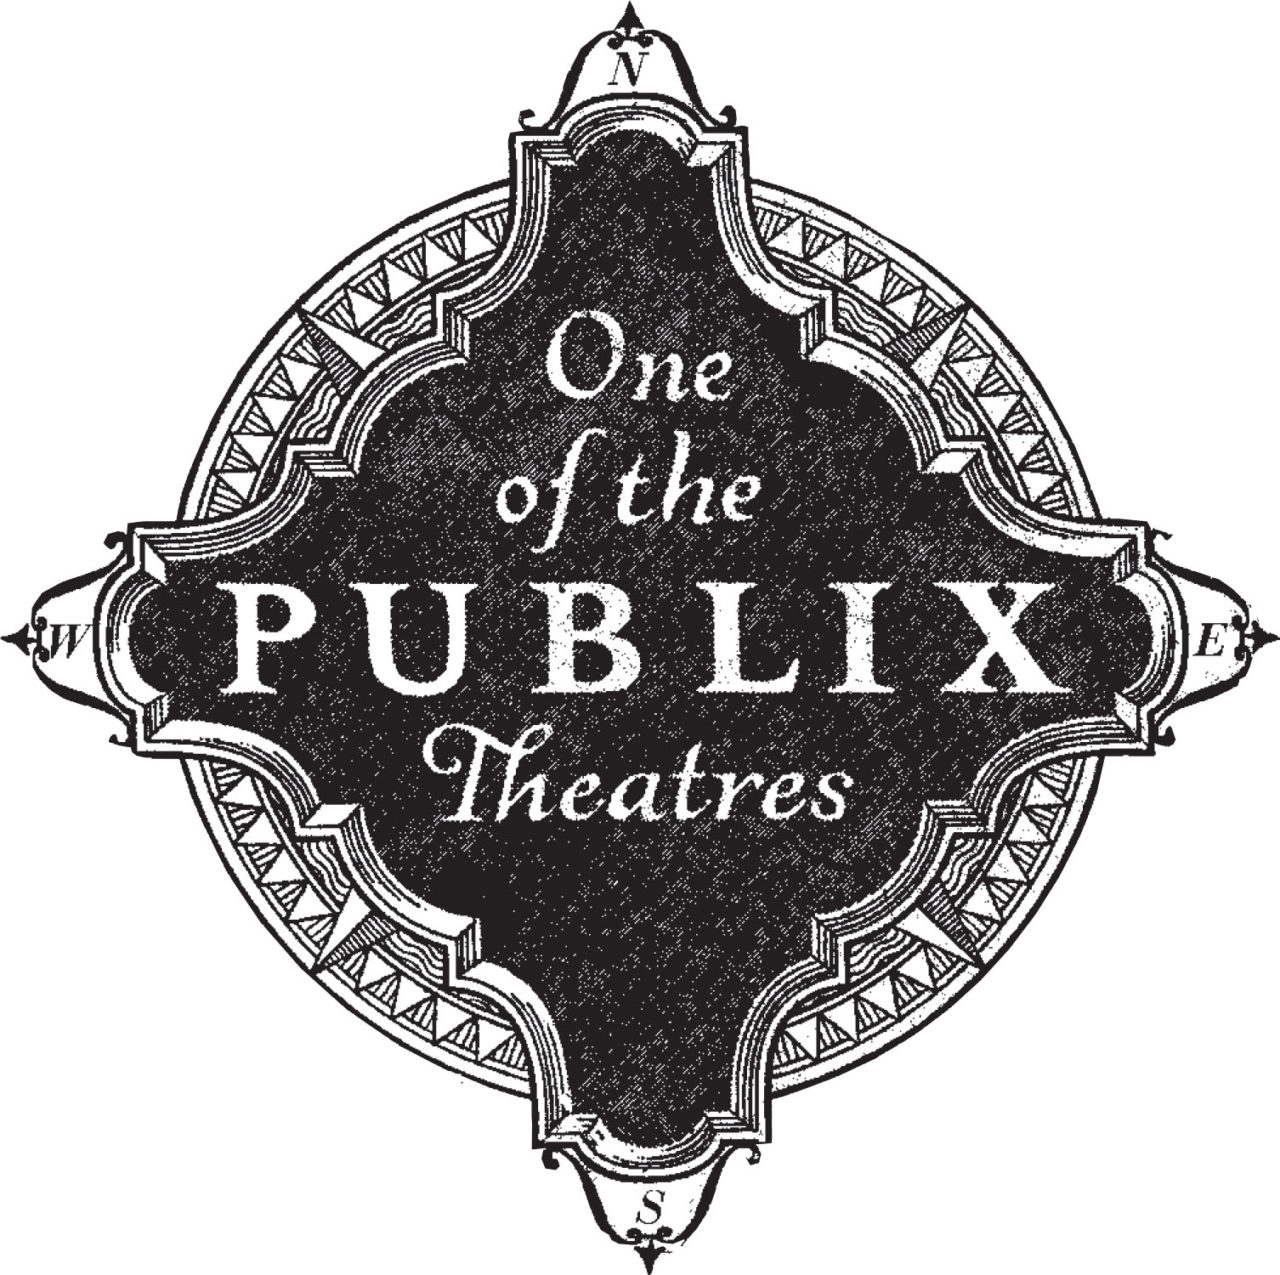 Publix logo - Carolina Theatre was part of the Publix Theatres chain